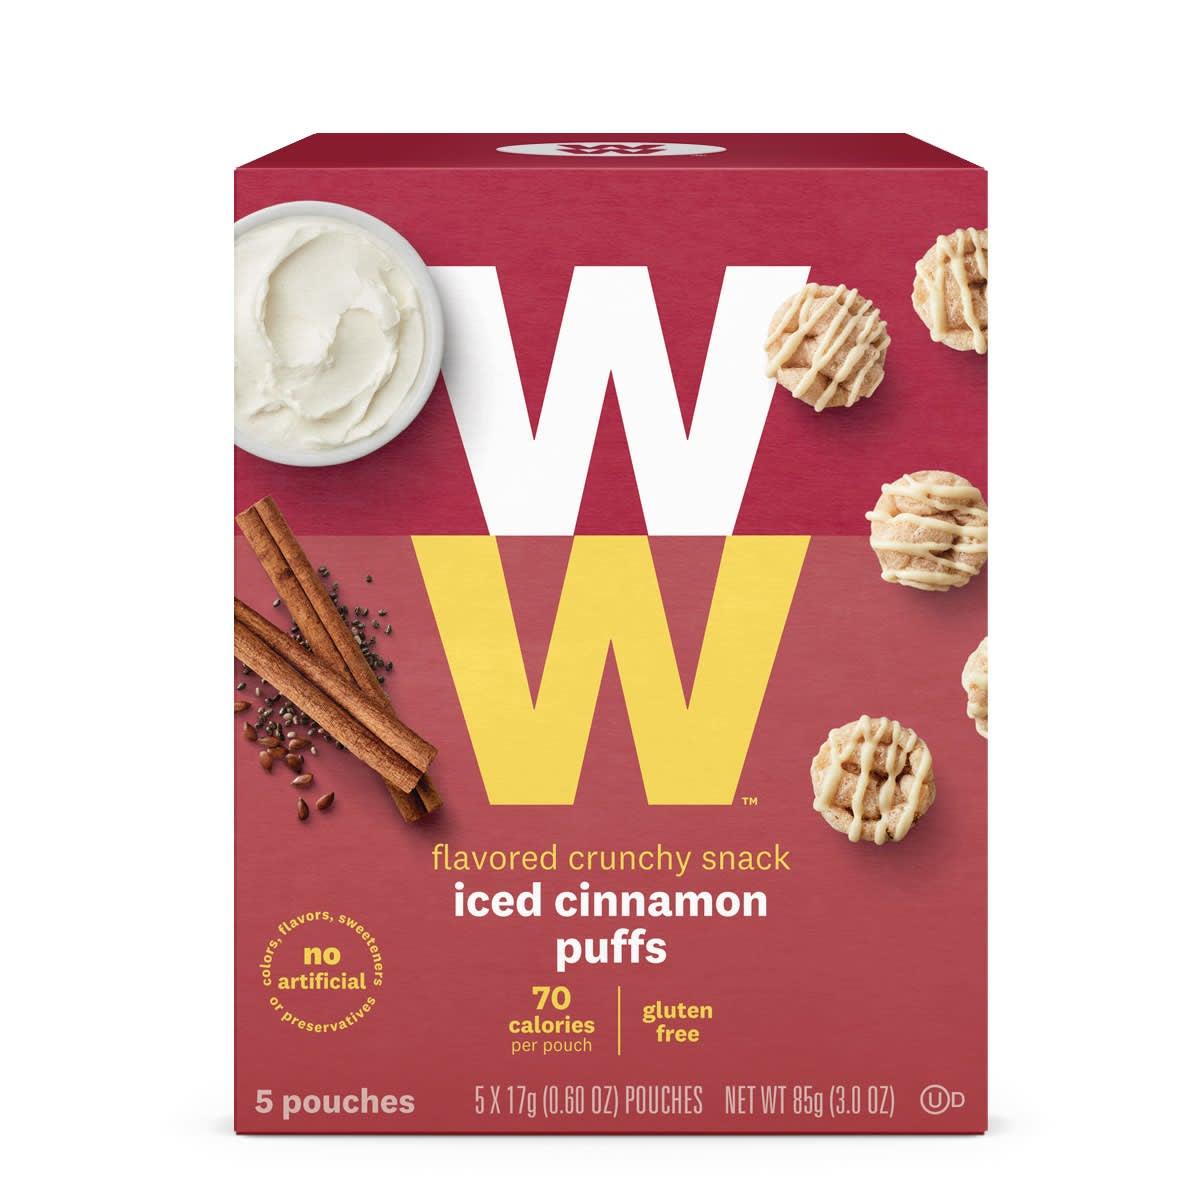 Iced Cinnamon Puffs, 5 pouches, gluten free, 70 calories